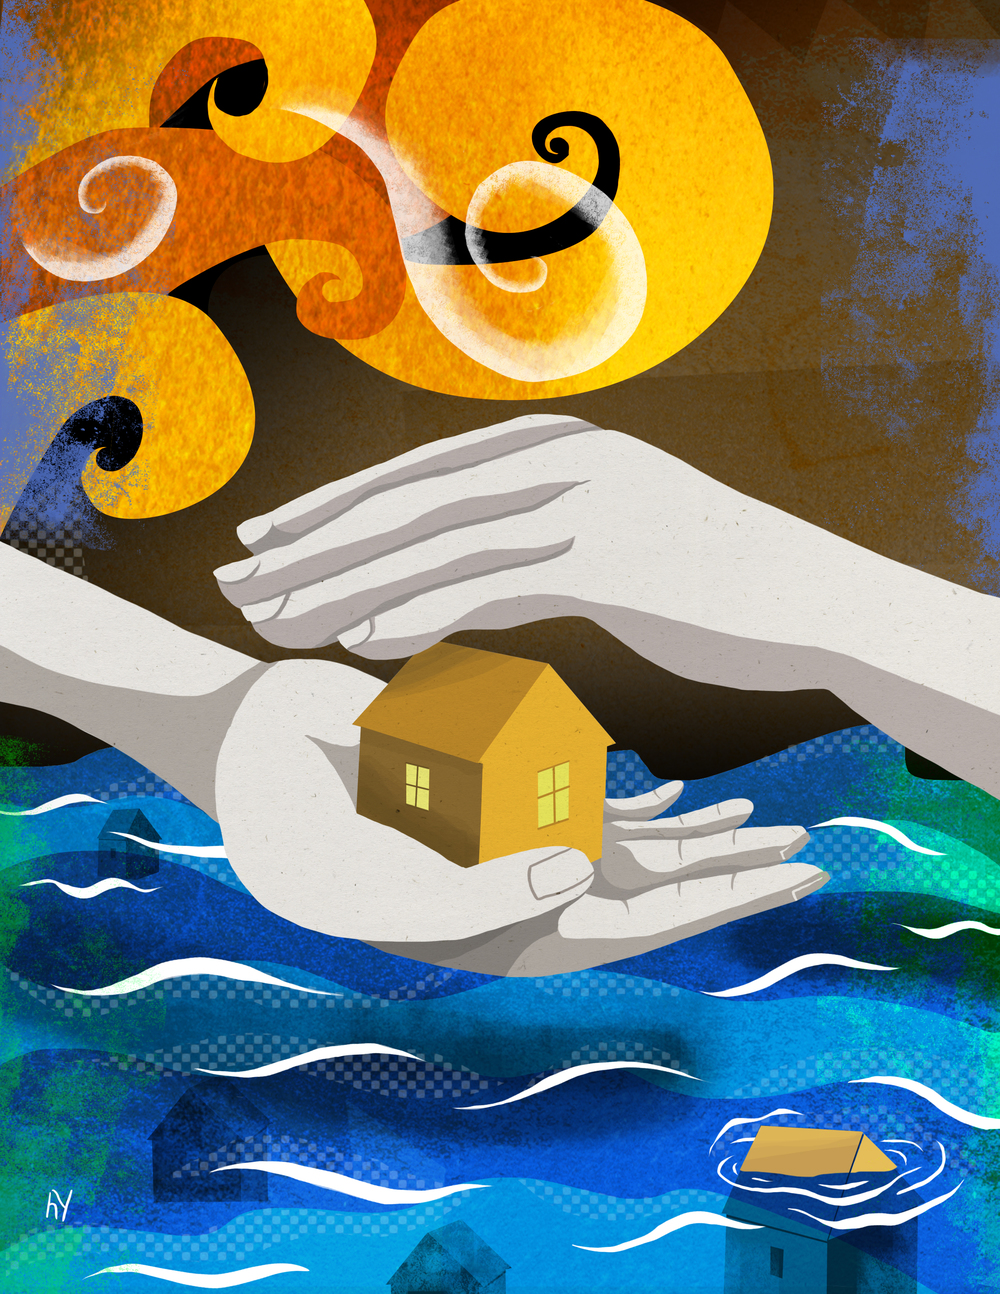 Flood insurance, for Common Ground Magazine